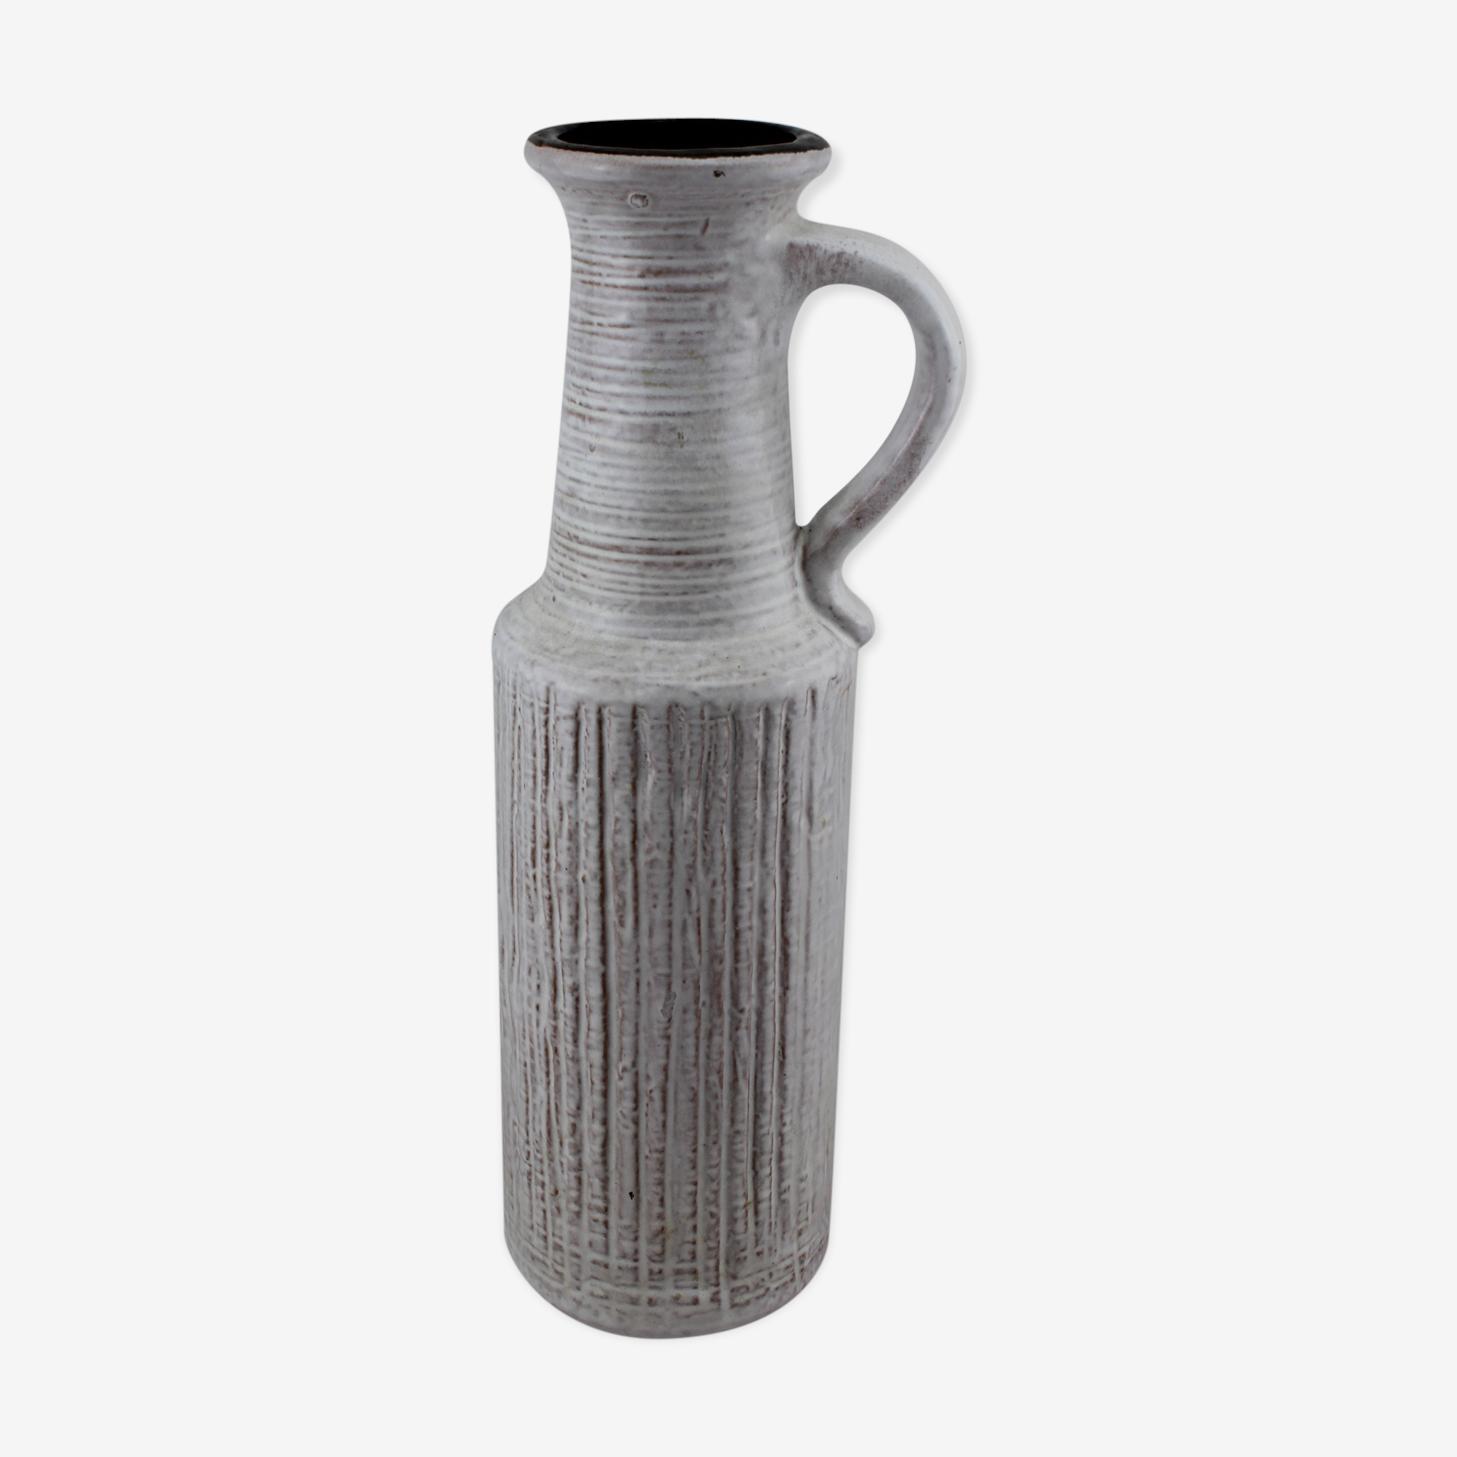 Large white vase Castens West Germany